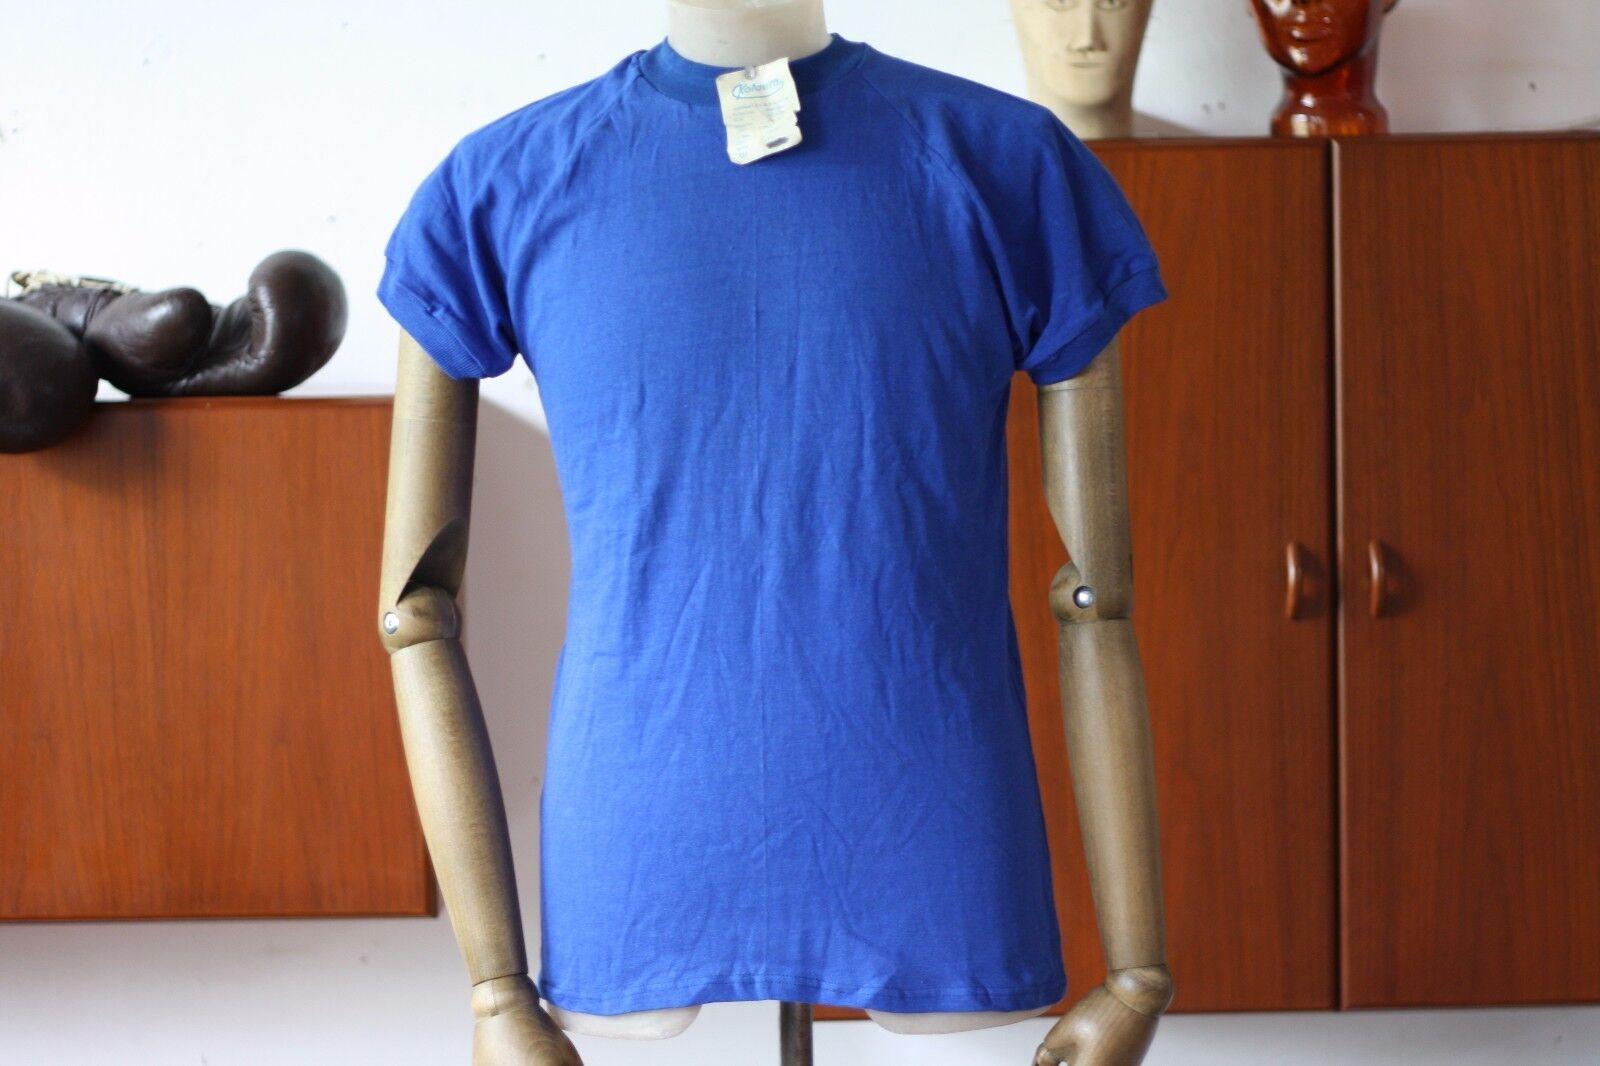 VEB Kotaura DDR VINTAGE Trikot Spielerhemd blau TRUE VINTAGE DDR 70s sports shirt Blau GDR 454c31